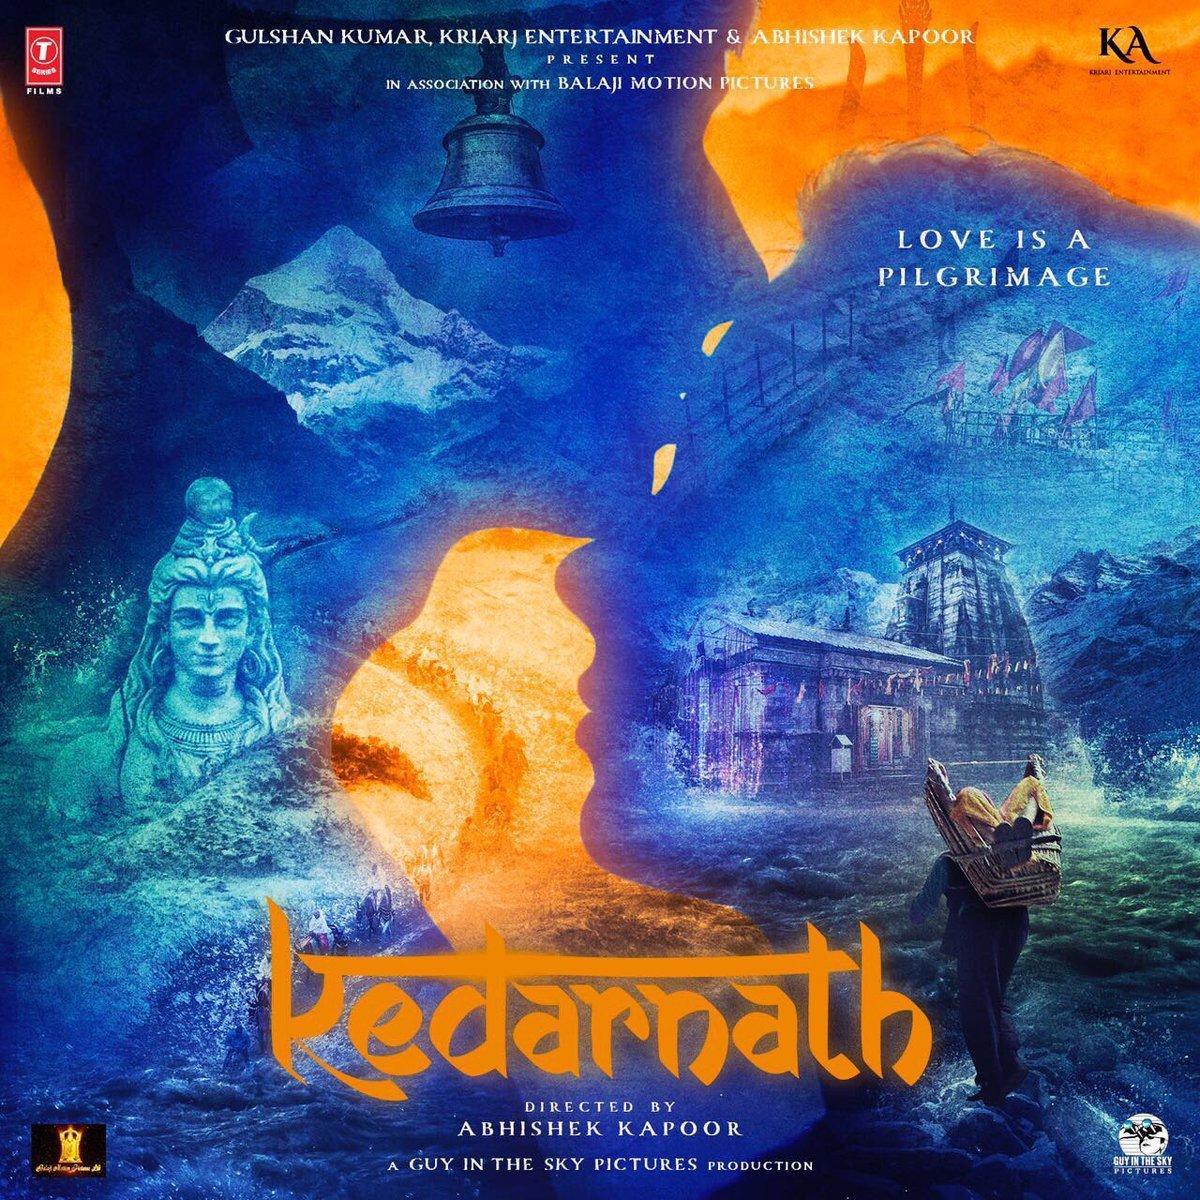 Kedarnath Picture Gallery